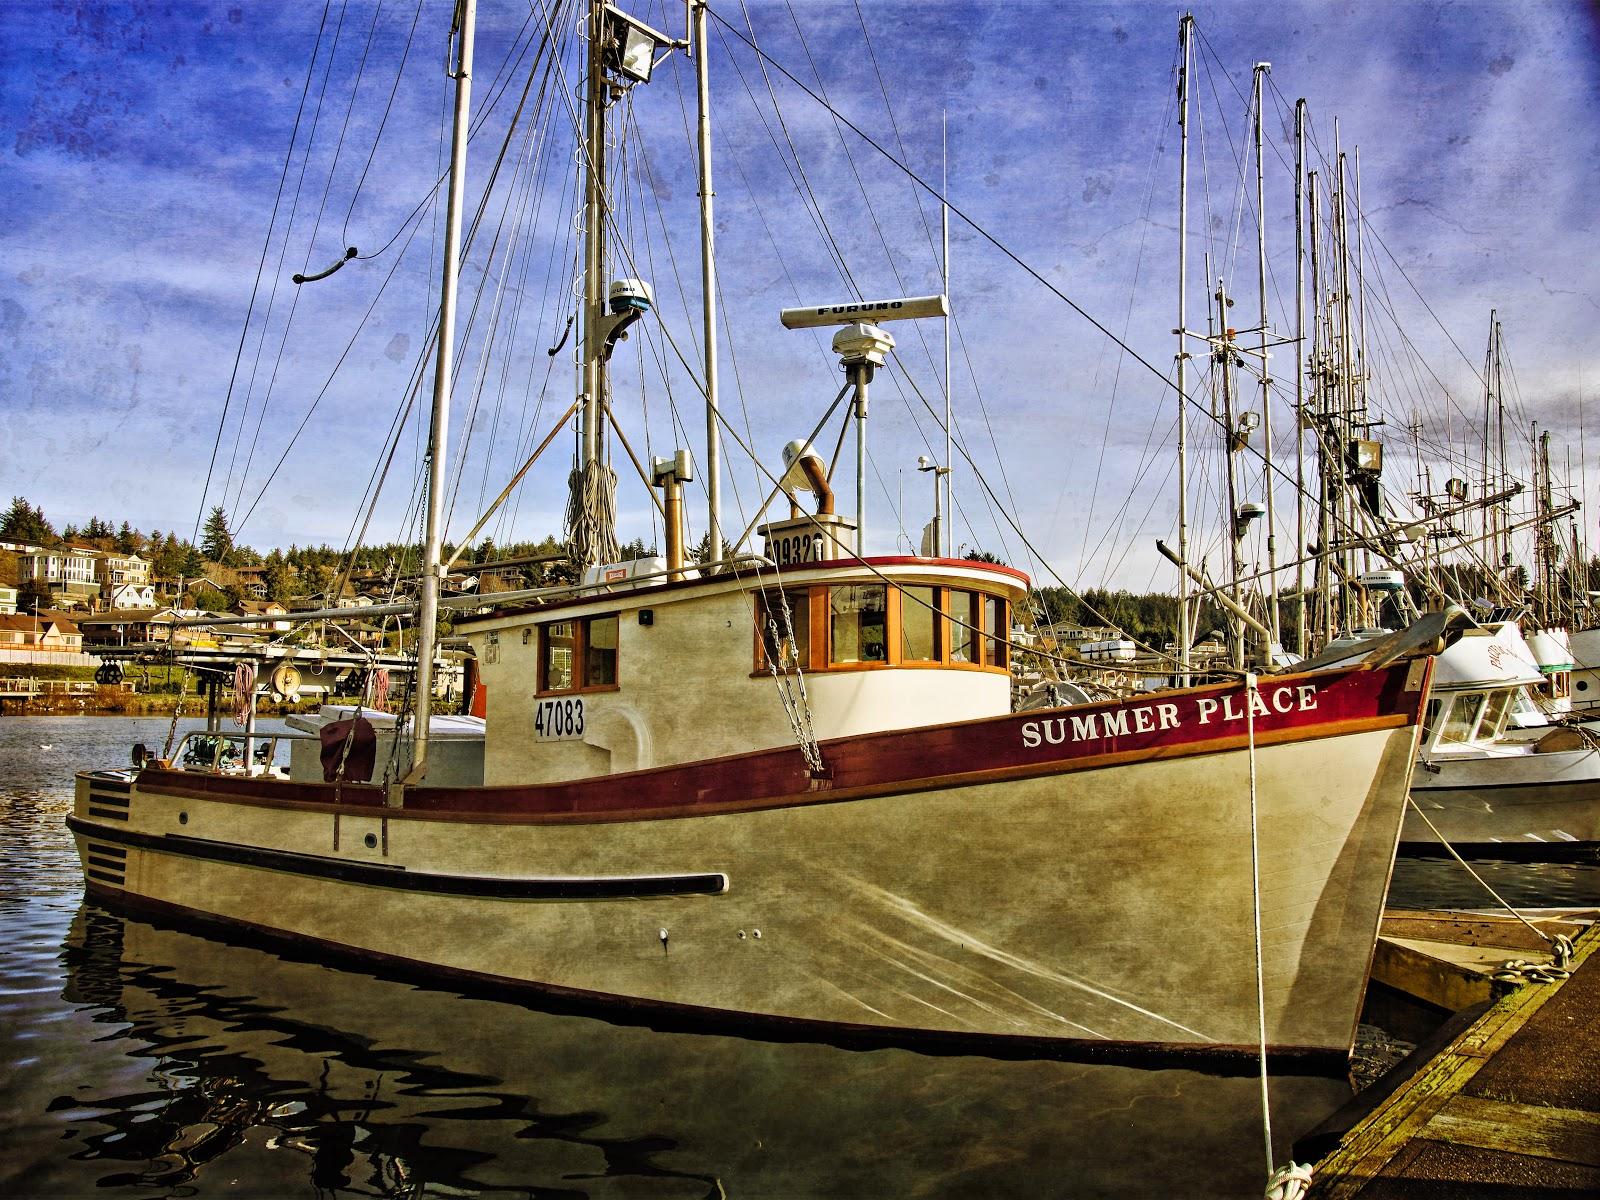 Thom zehrfeld photography 2014 12 07 for Newport oregon fishing